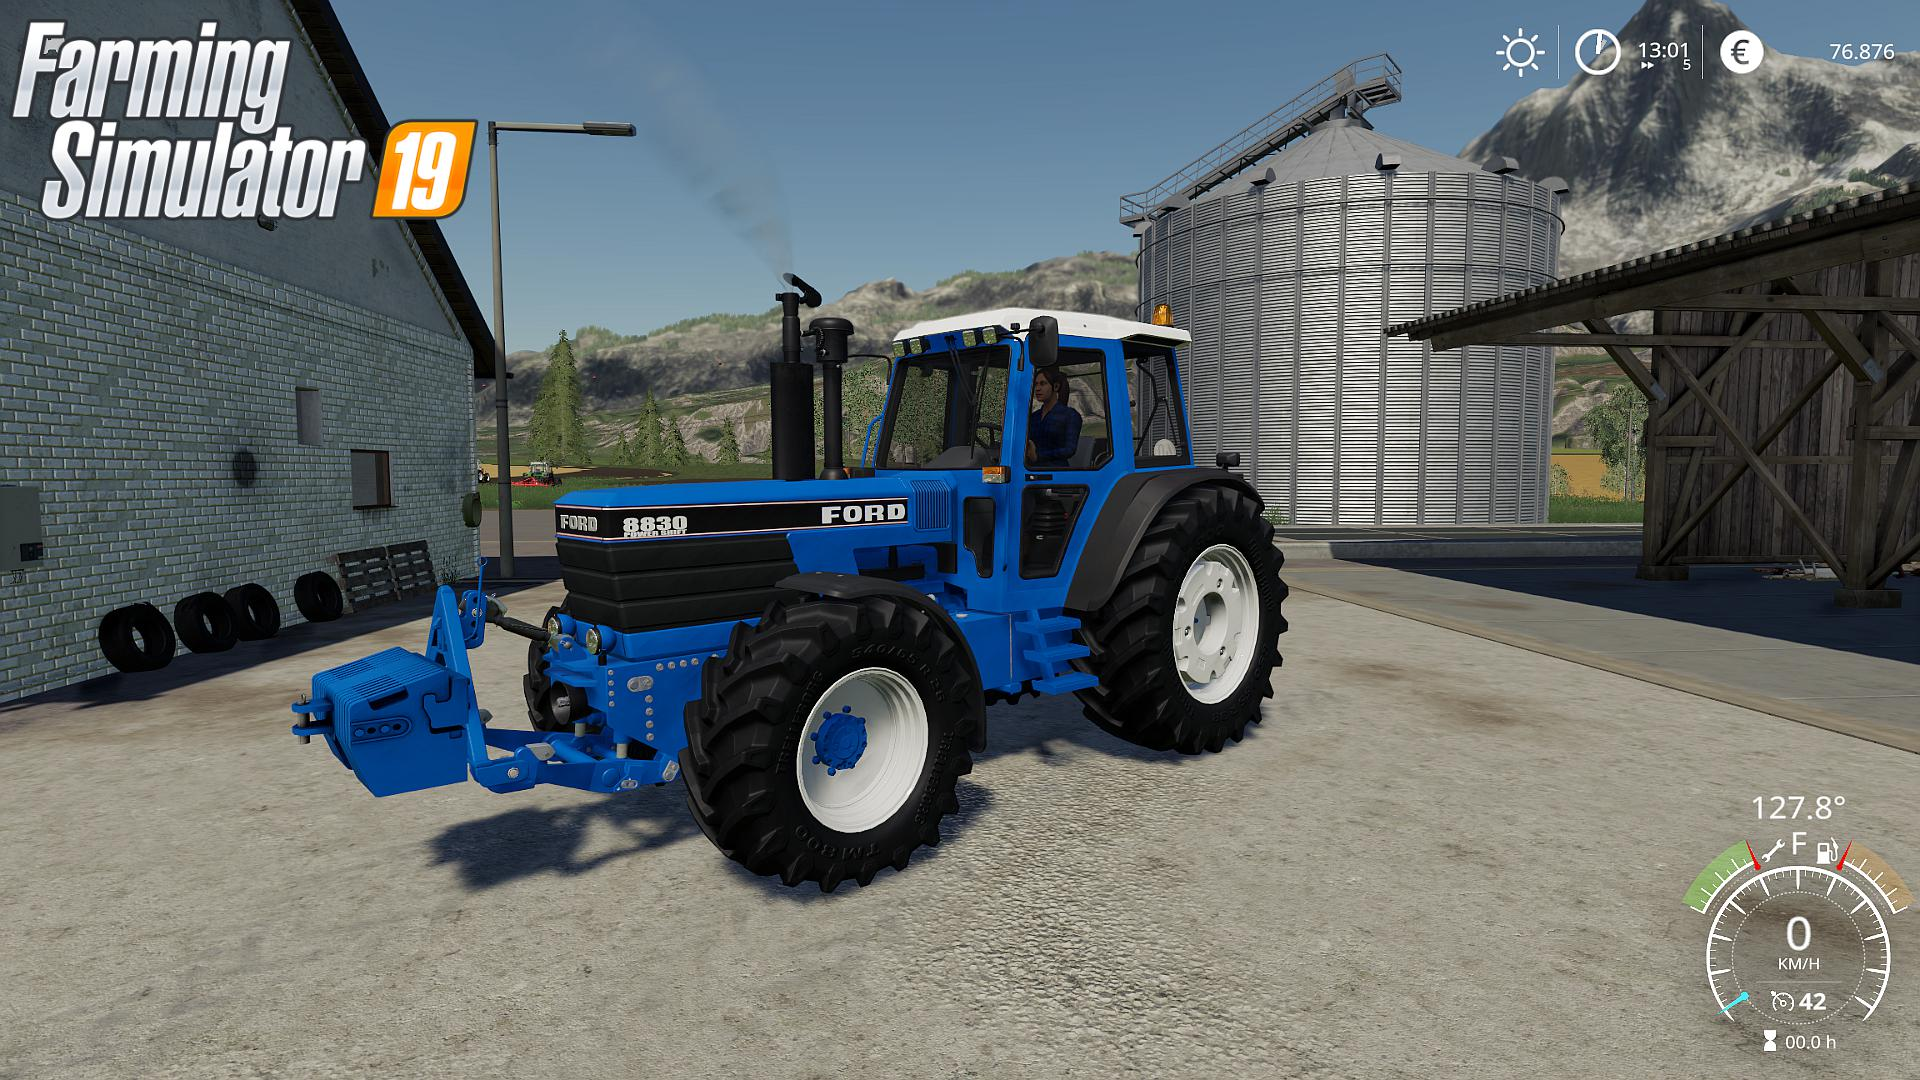 Diesel Fuel Production in Farming Simulator 19 - Ai Cave